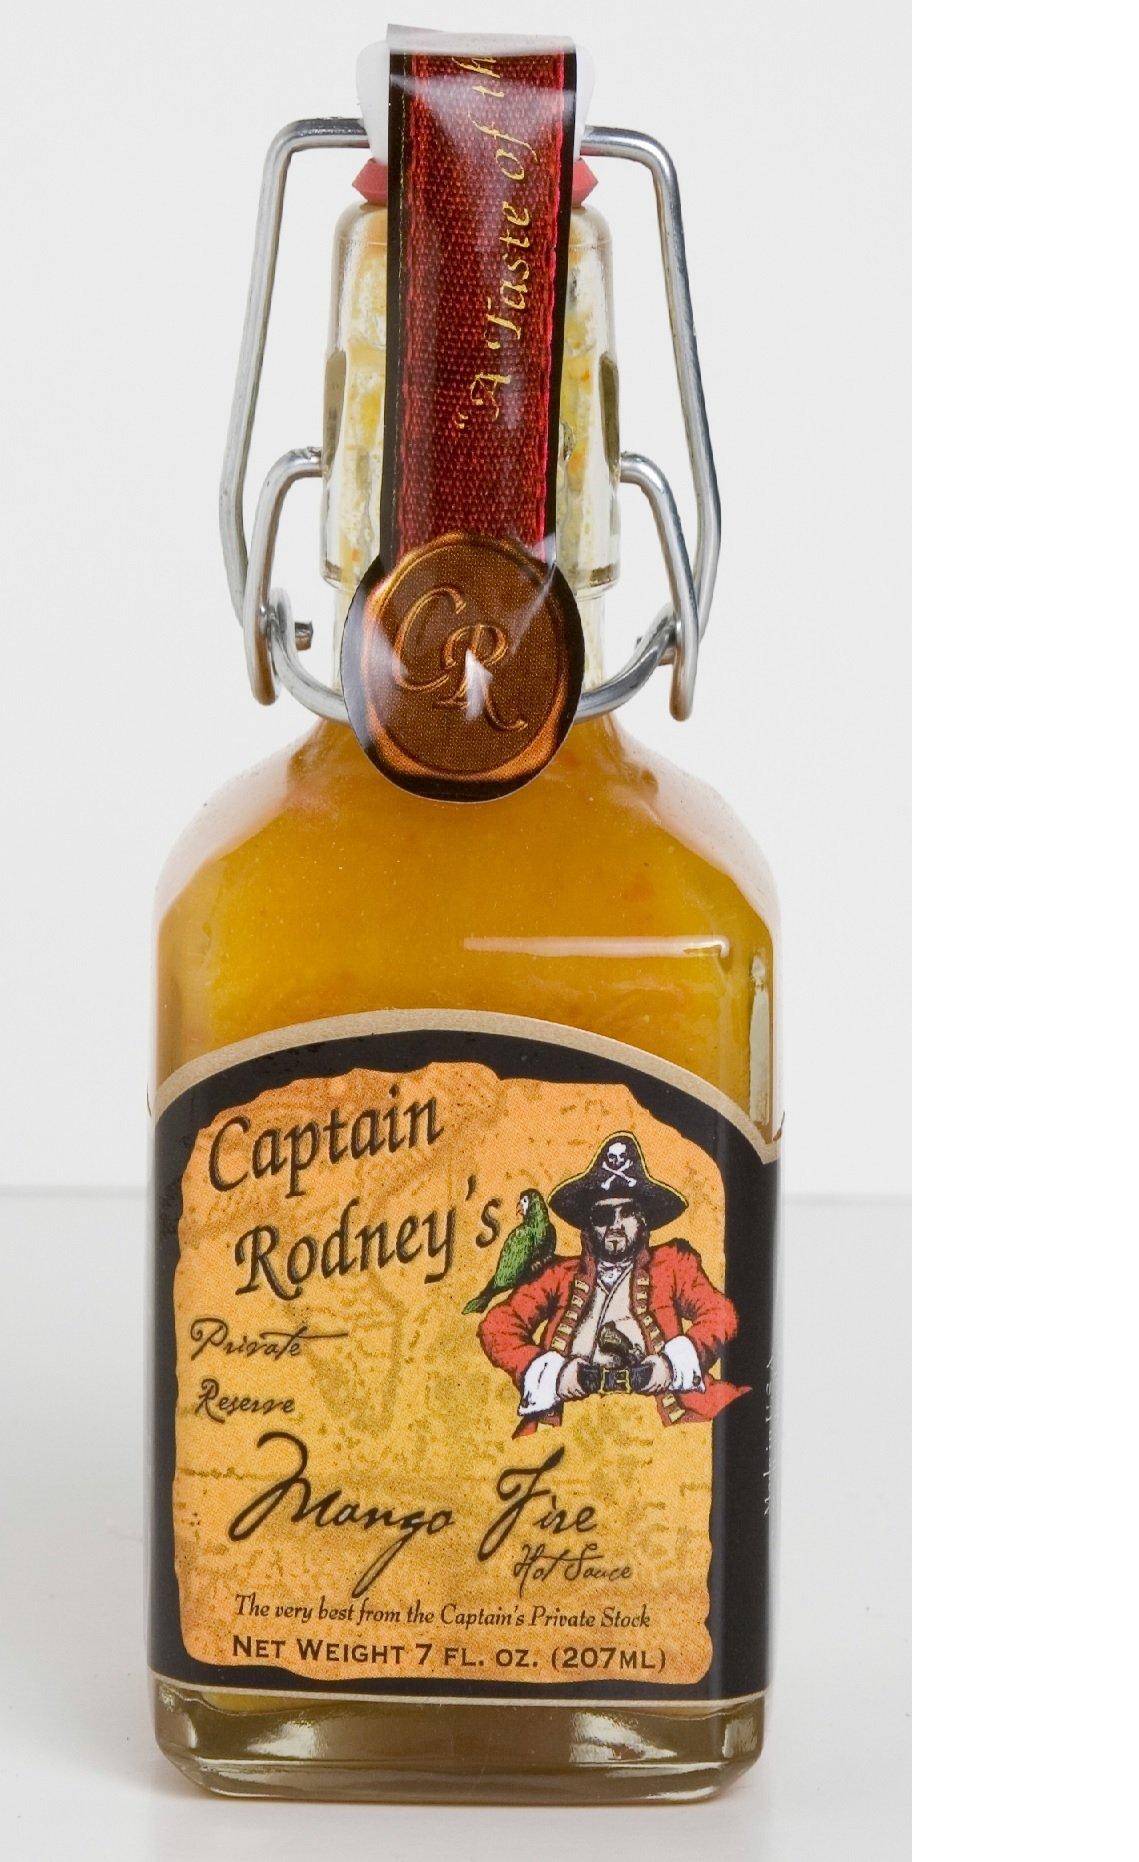 Captain Rodney's Private Reserve Mango Hot Fire Sauce 7.0 OZ